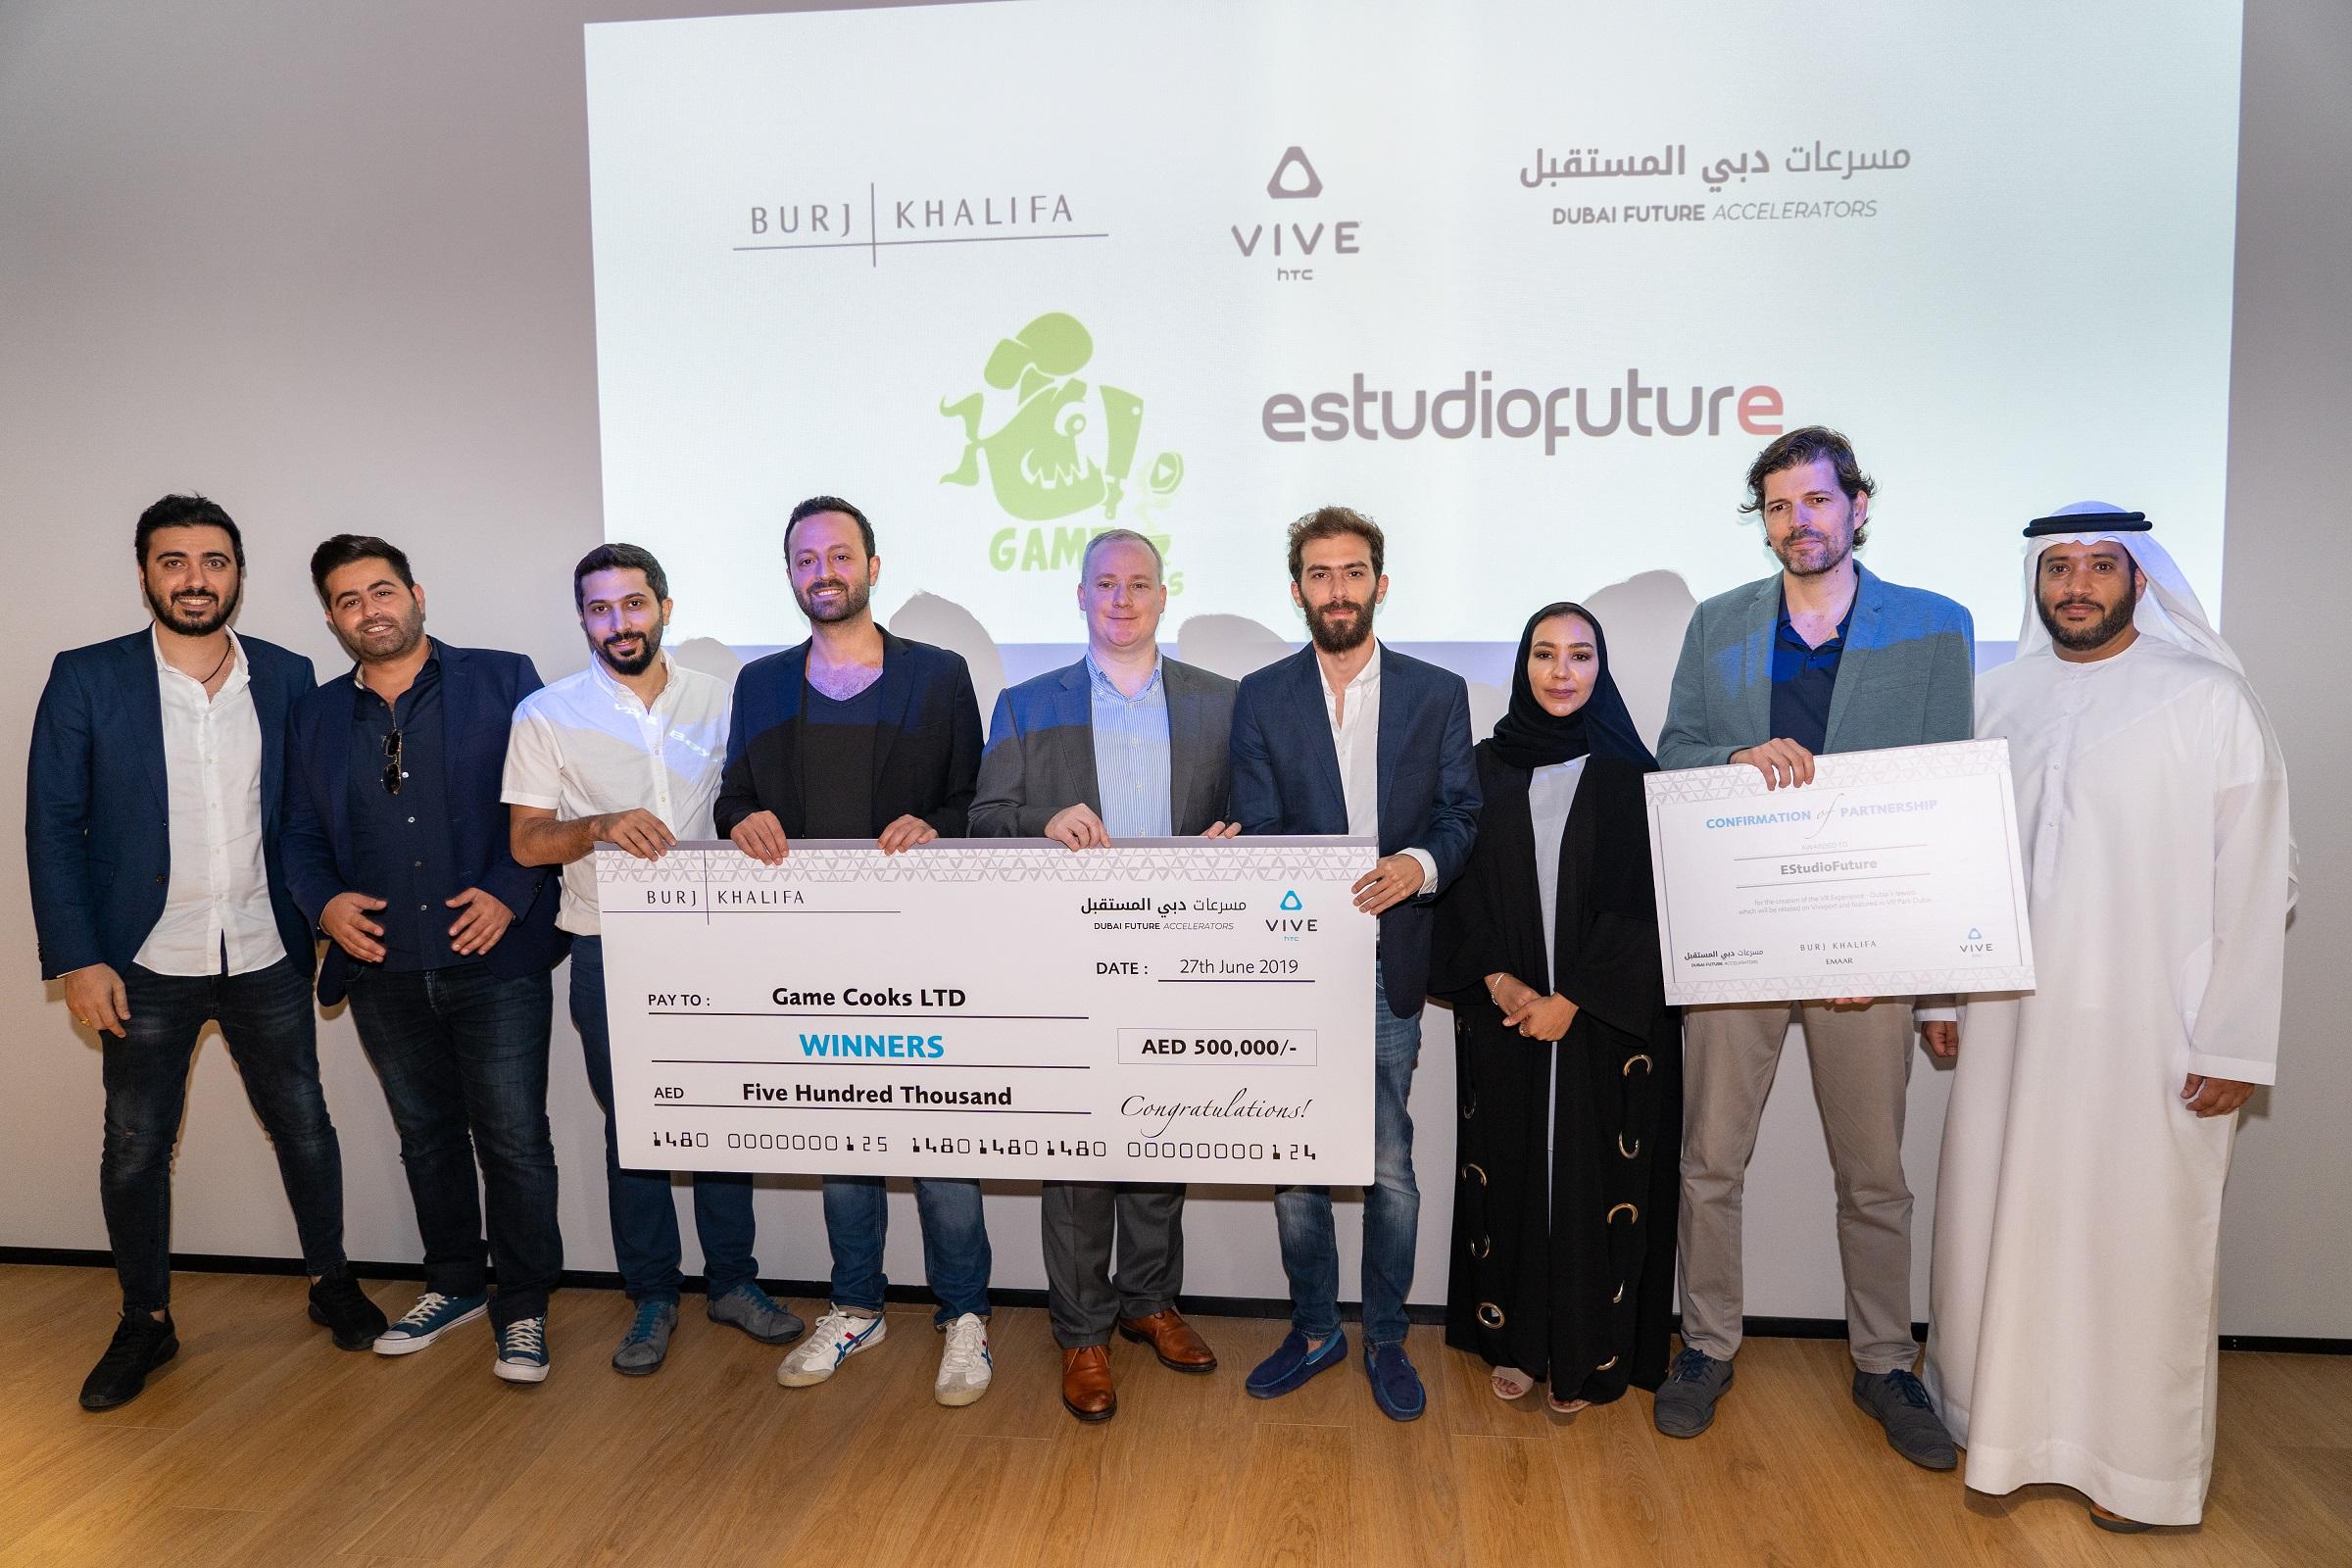 Winners of VR & Beyond Competition with Representatives from Burj Khalifa, HTC Vive & Dubai Future Accelerators